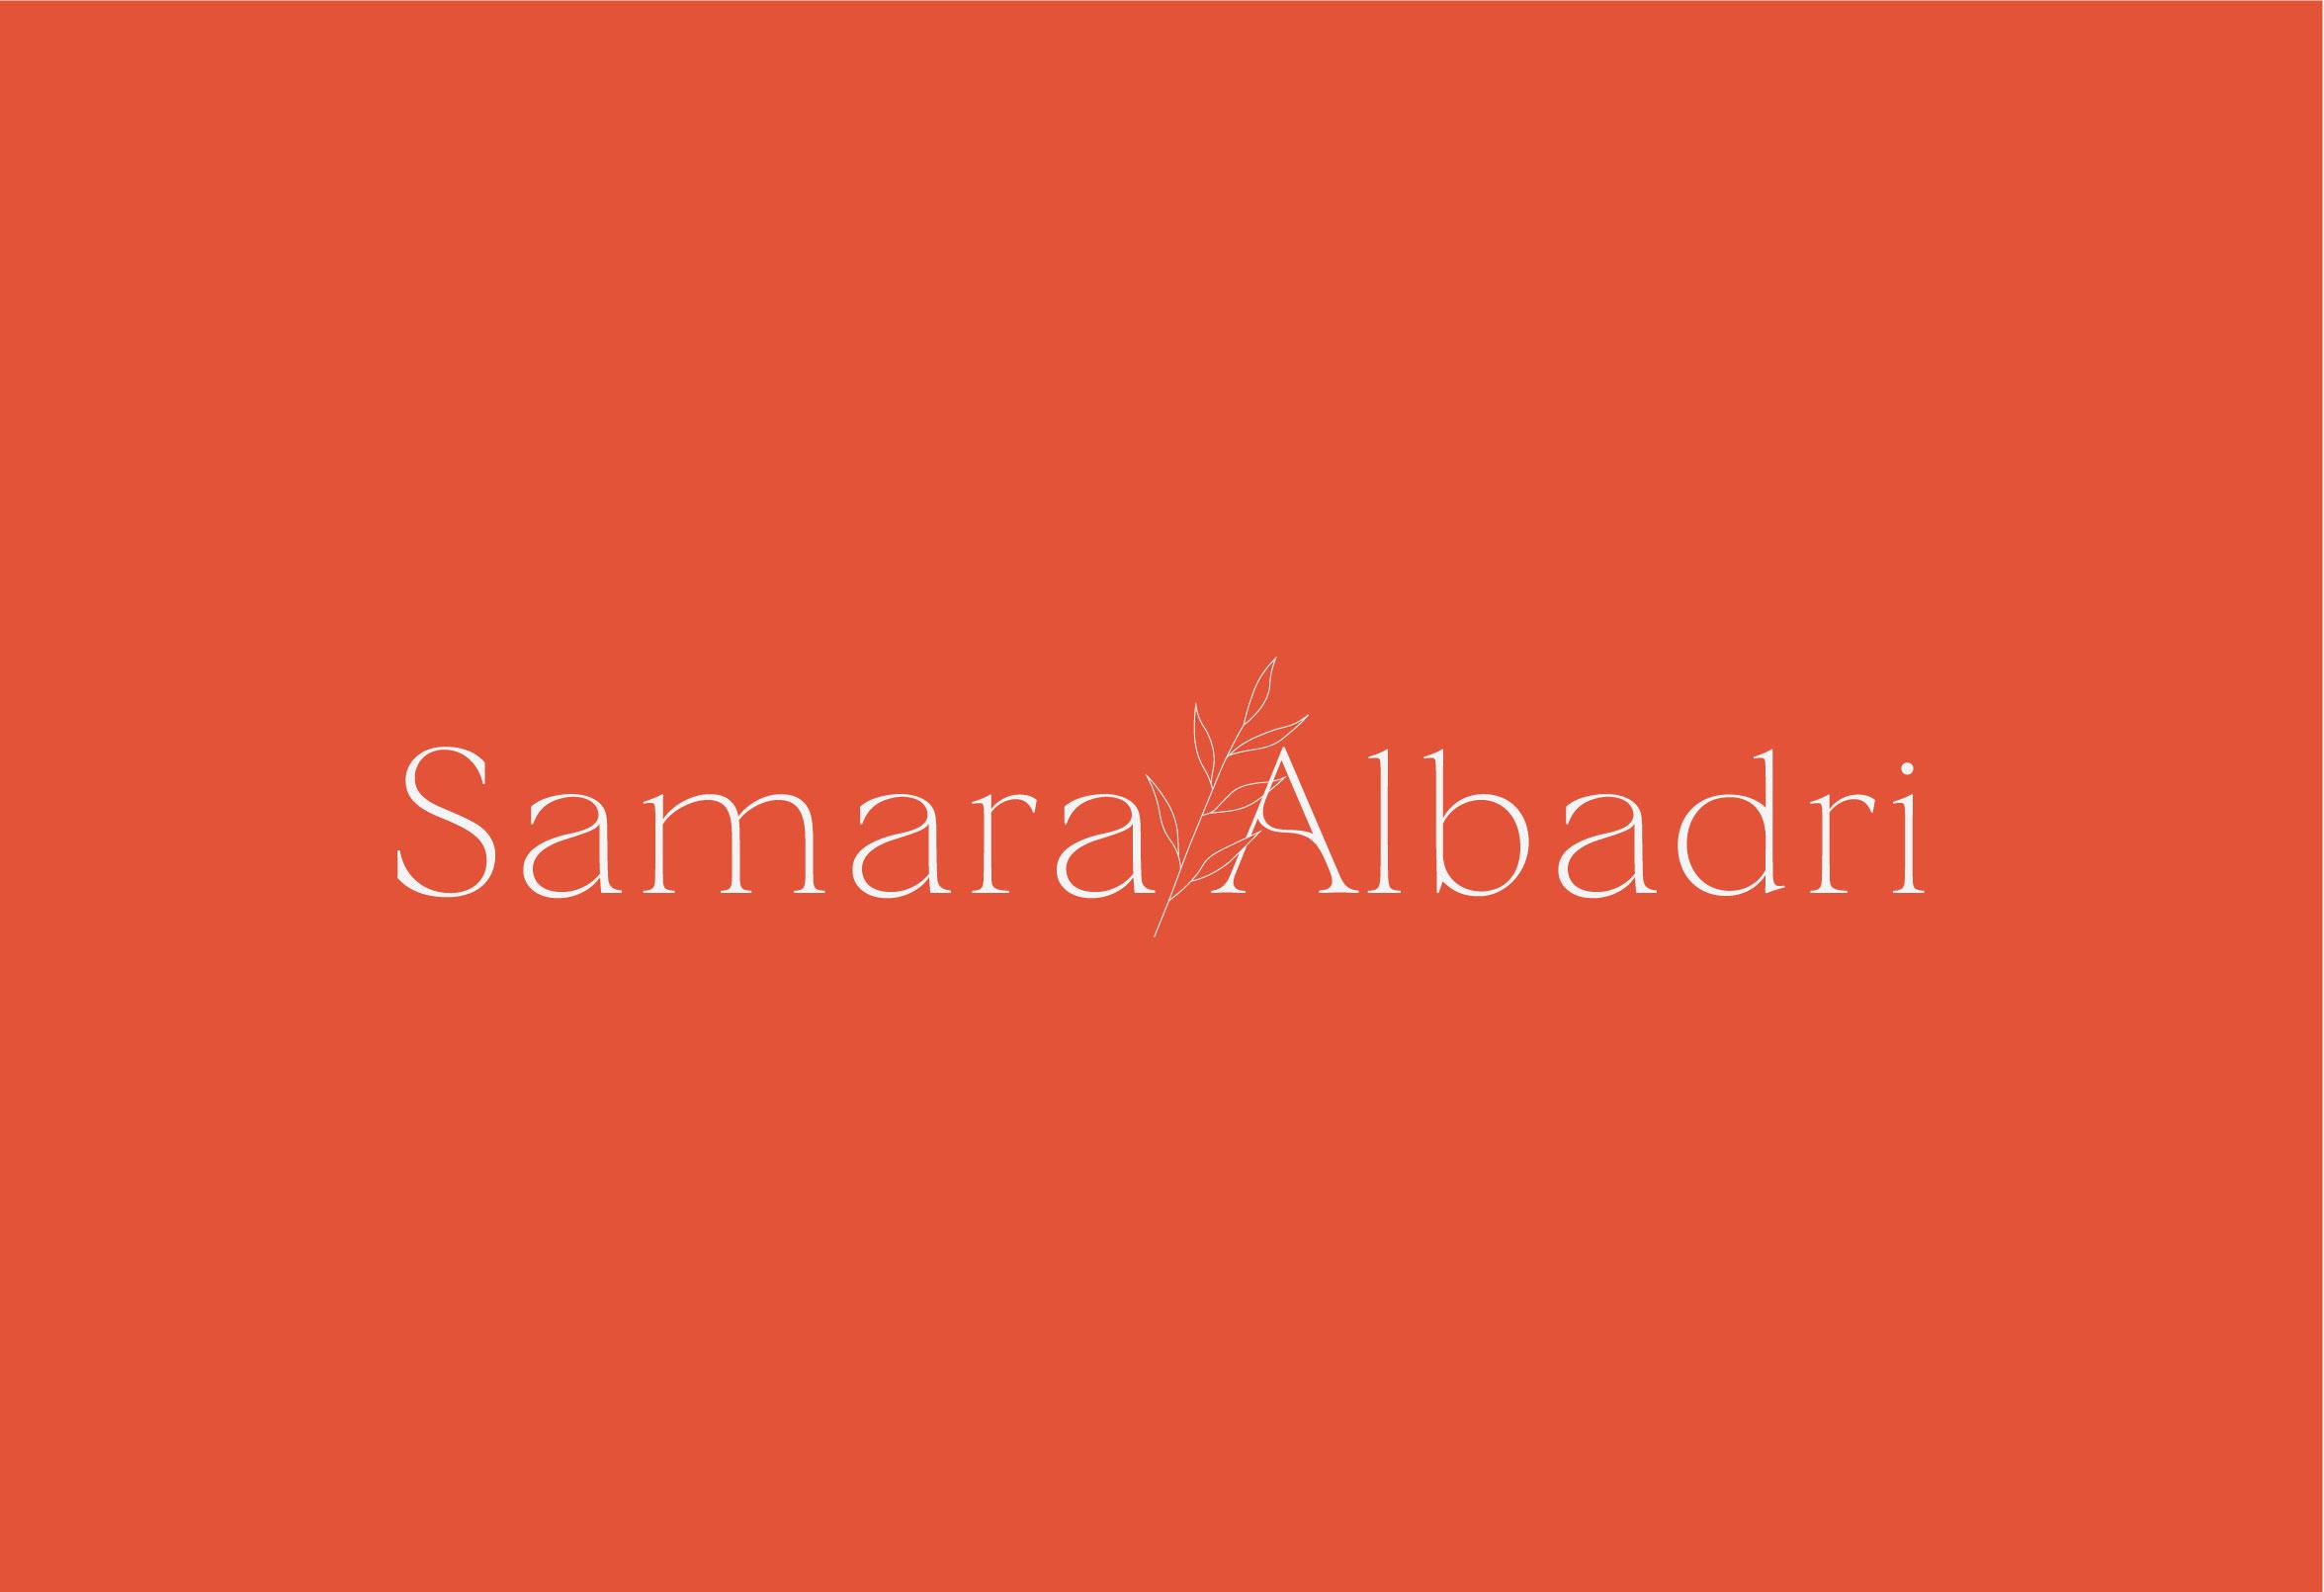 SamaraAlbadri_BrandBoard-02.jpg